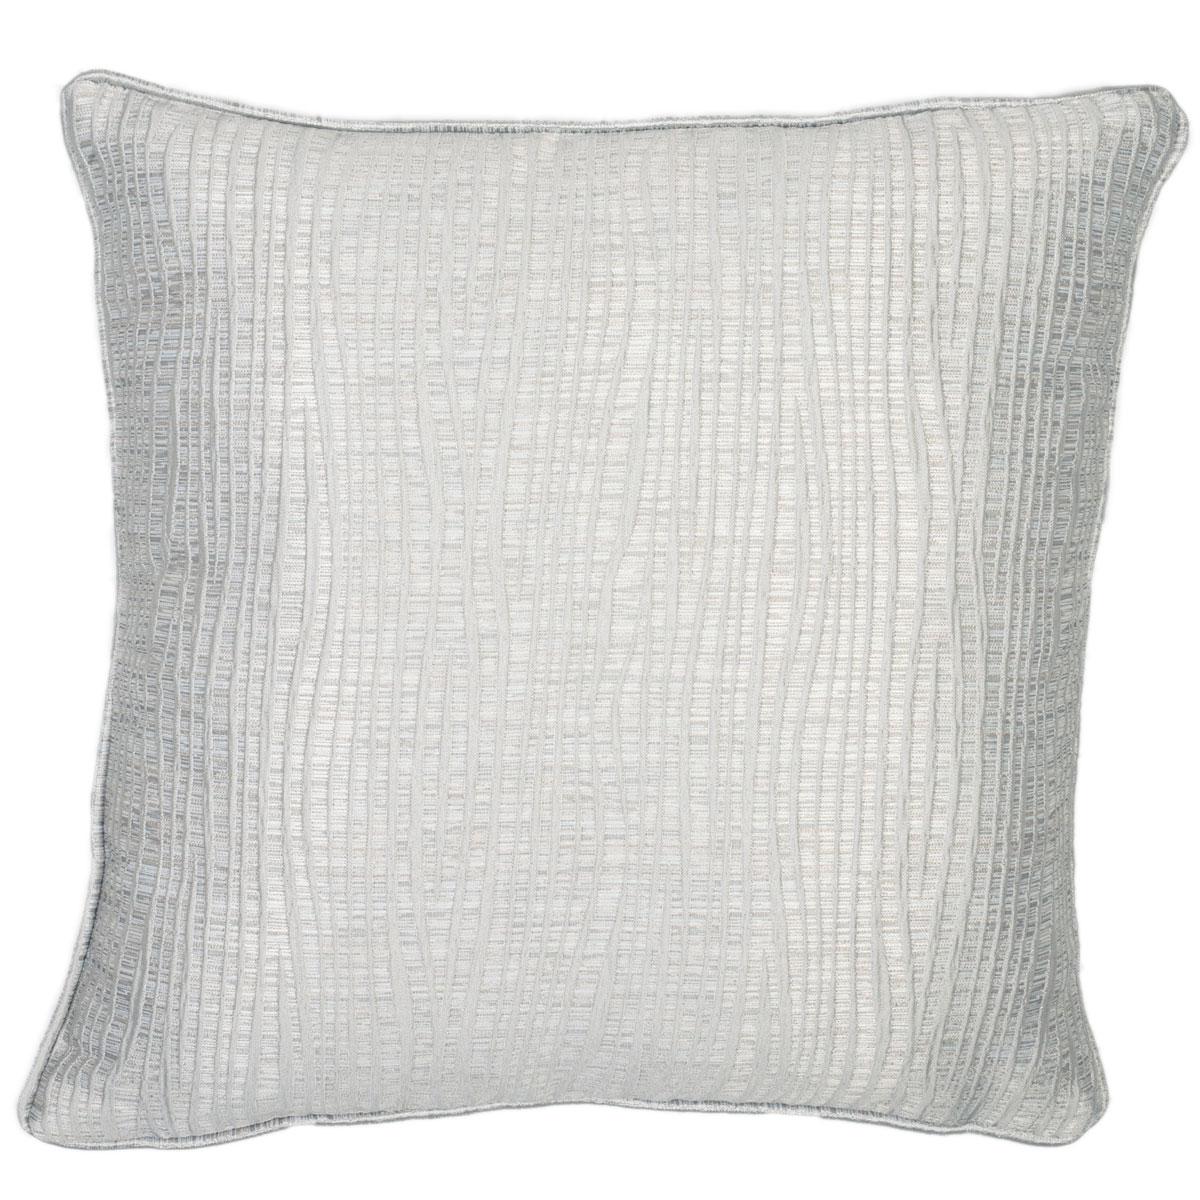 Graphite Twiggy Filled Cushion